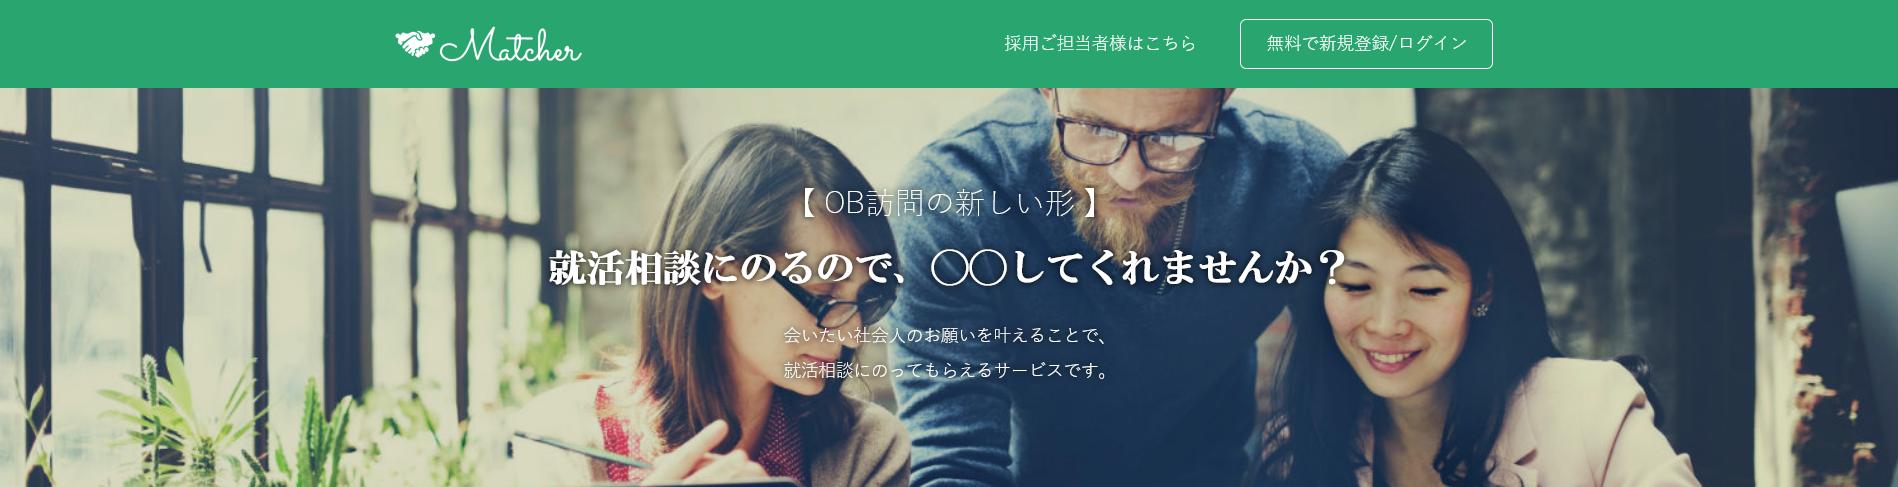 Matcher(マッチャ―)公式サイトの画像